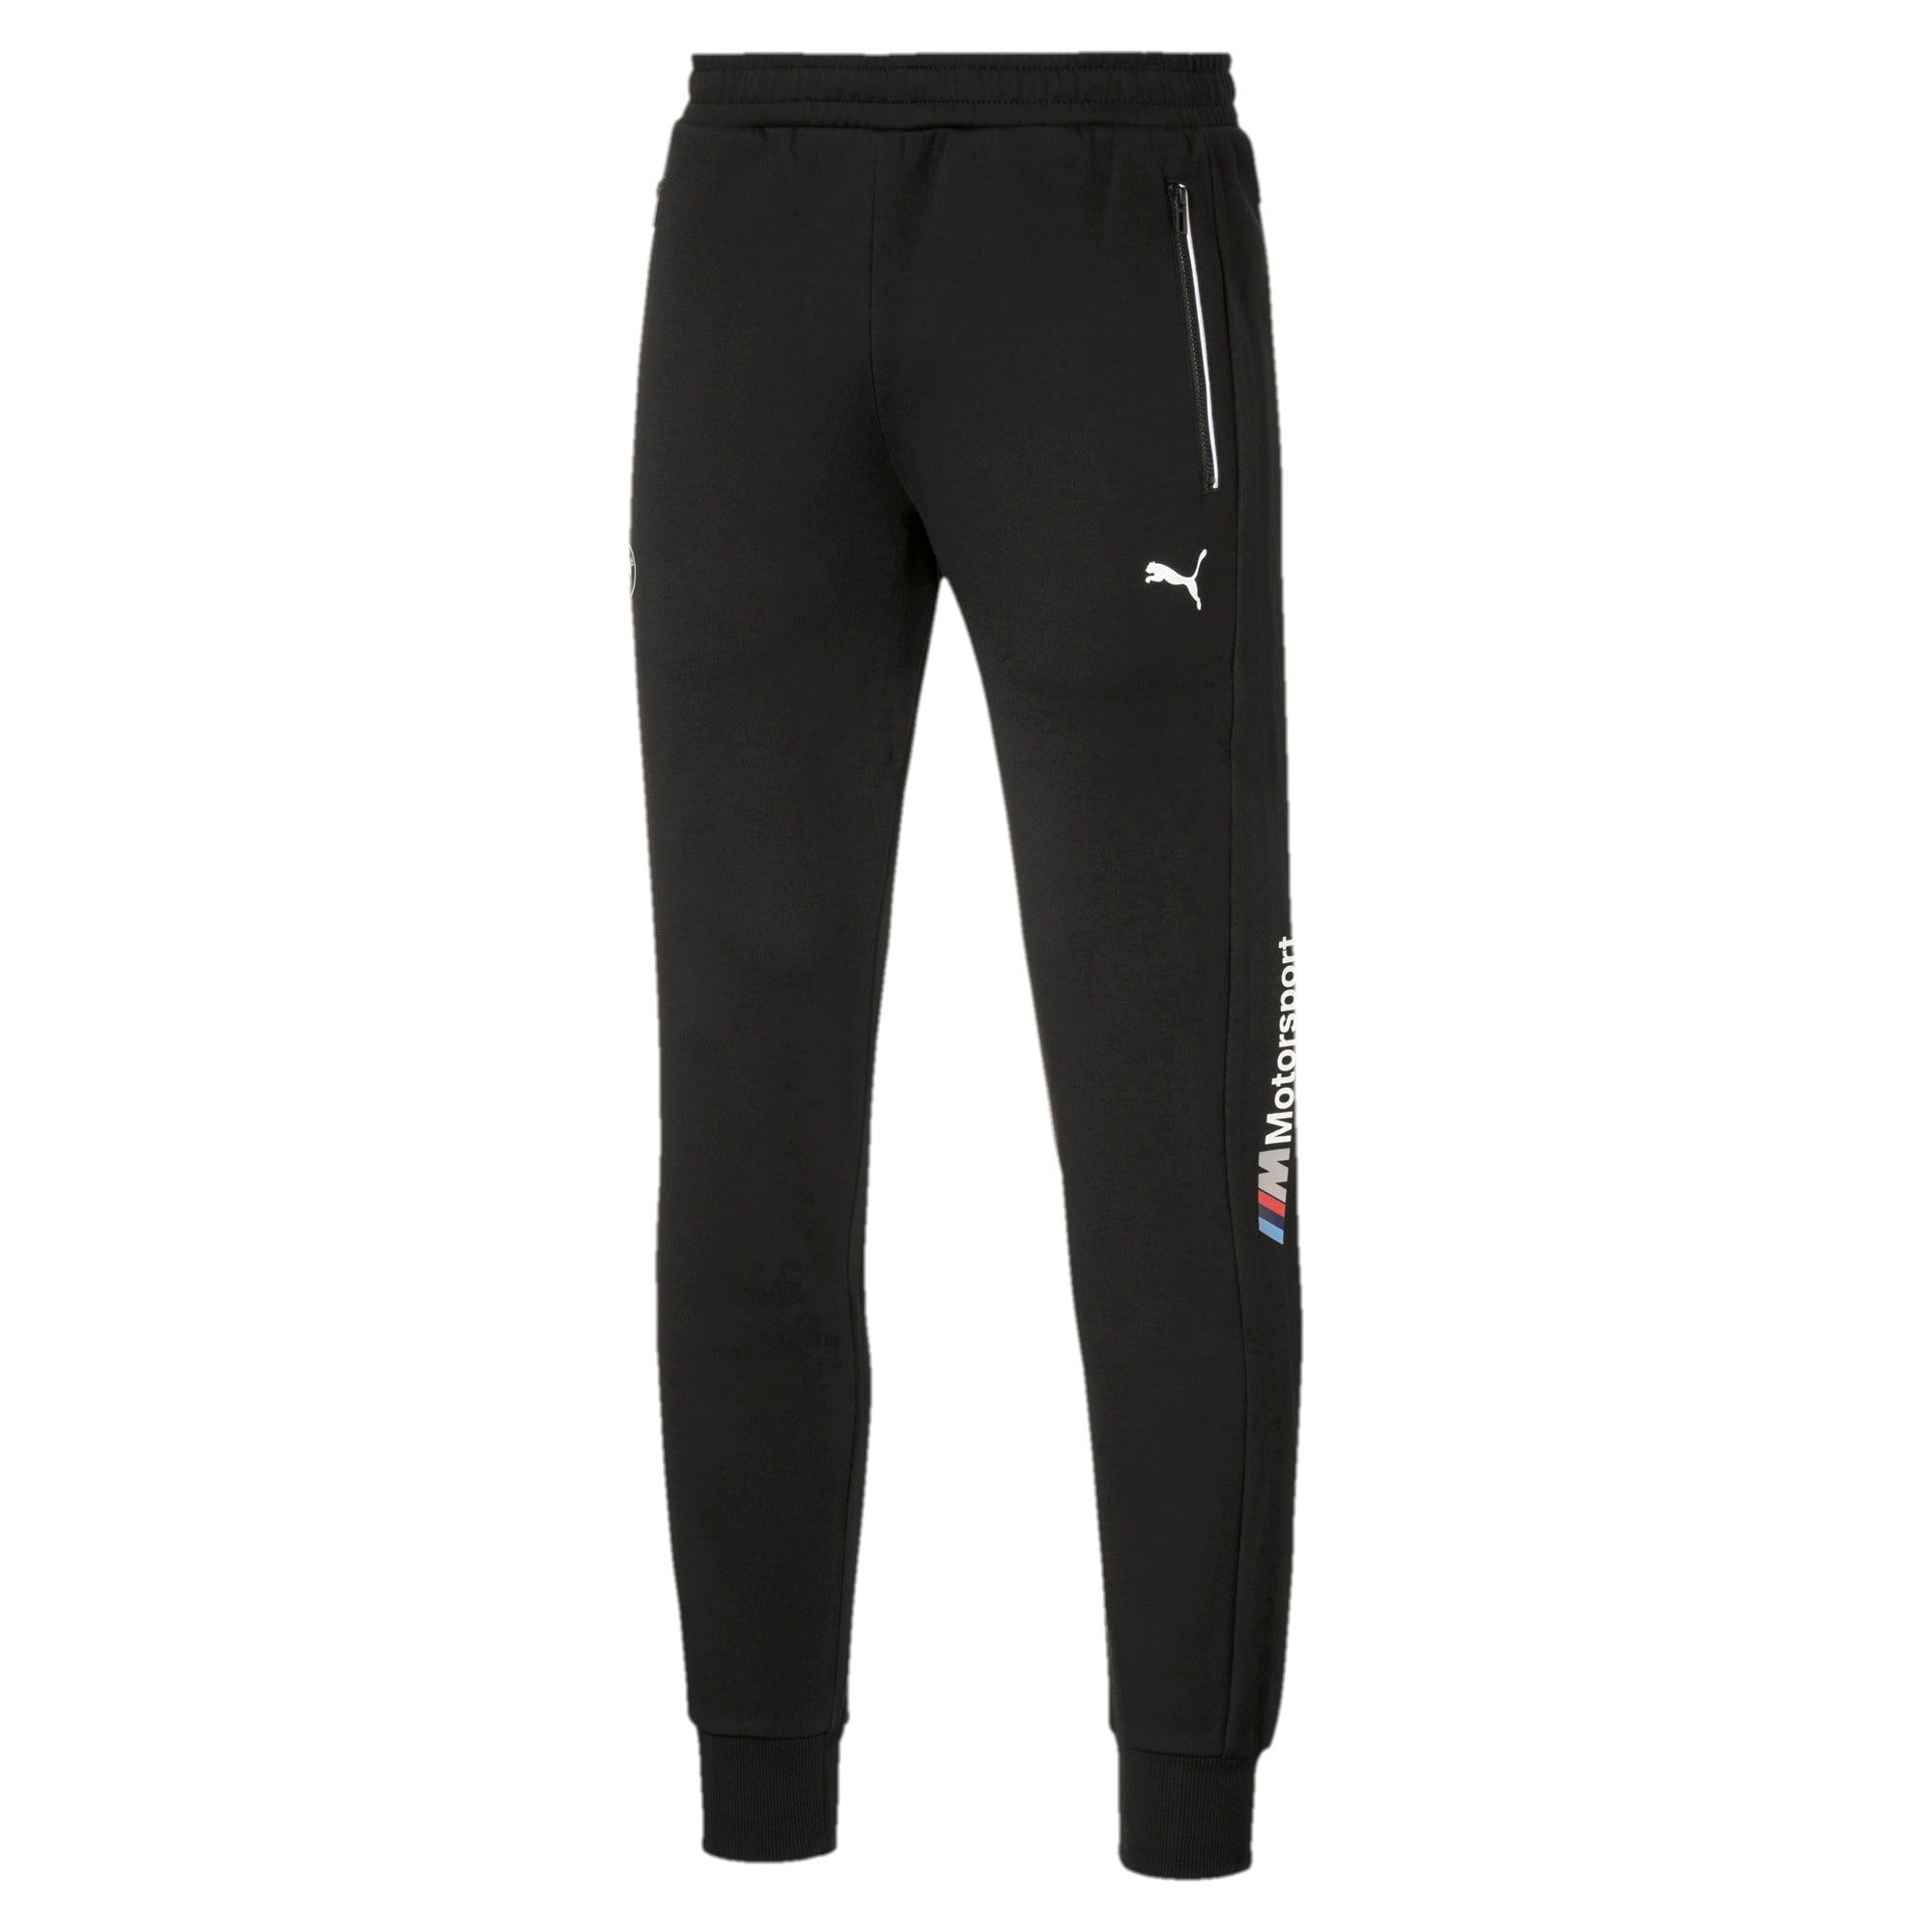 PUMA BMW M Motorsport Knitted Men's Sweatpants in Black size 2X Large #sweatpantsoutfit